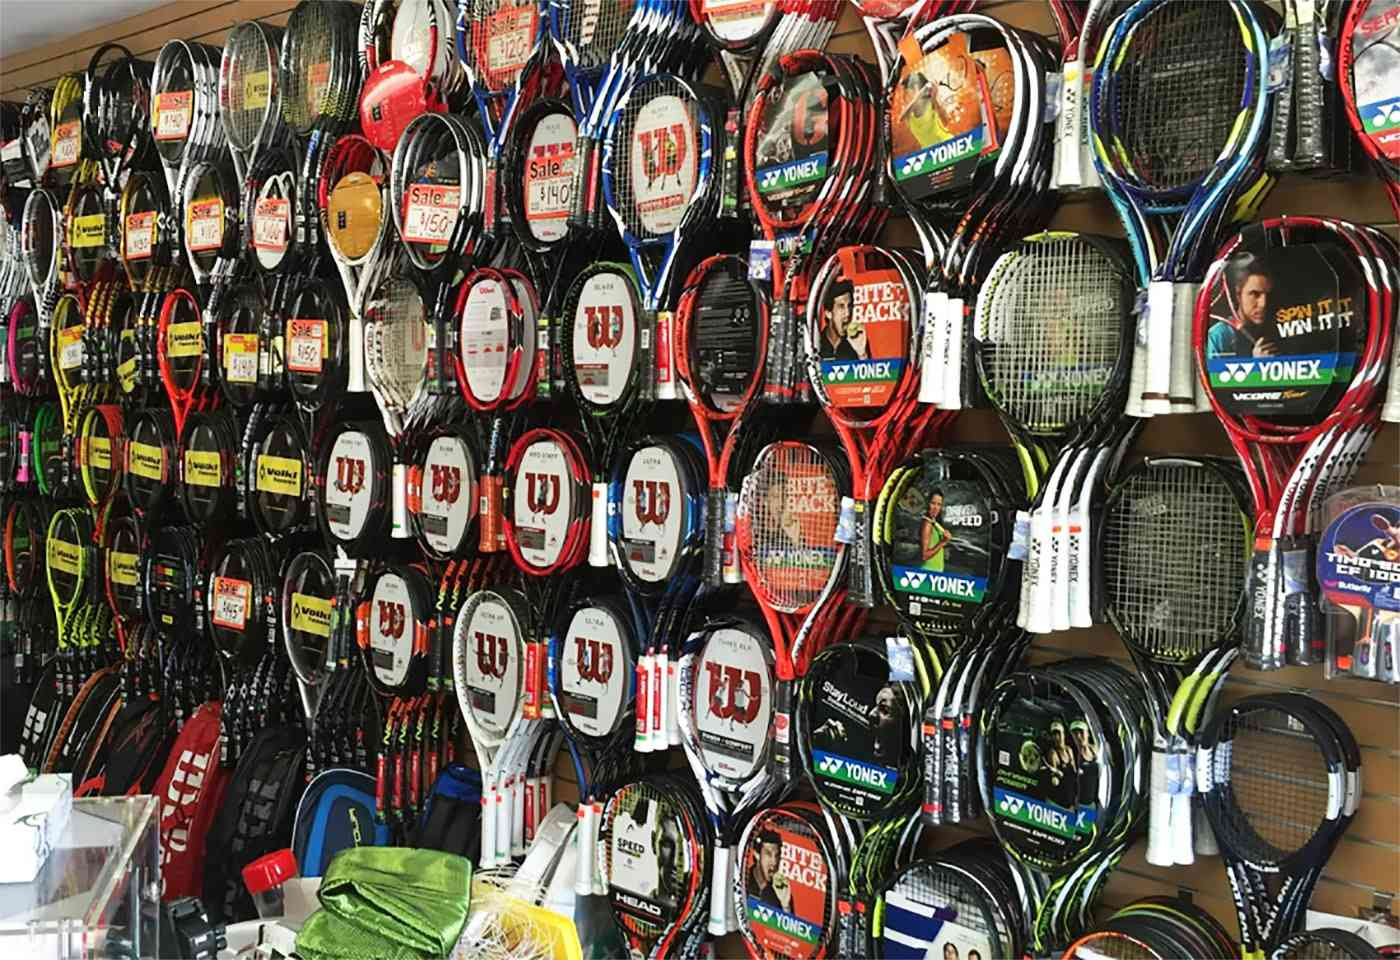 Ray's Tennis Shop in San Digeo